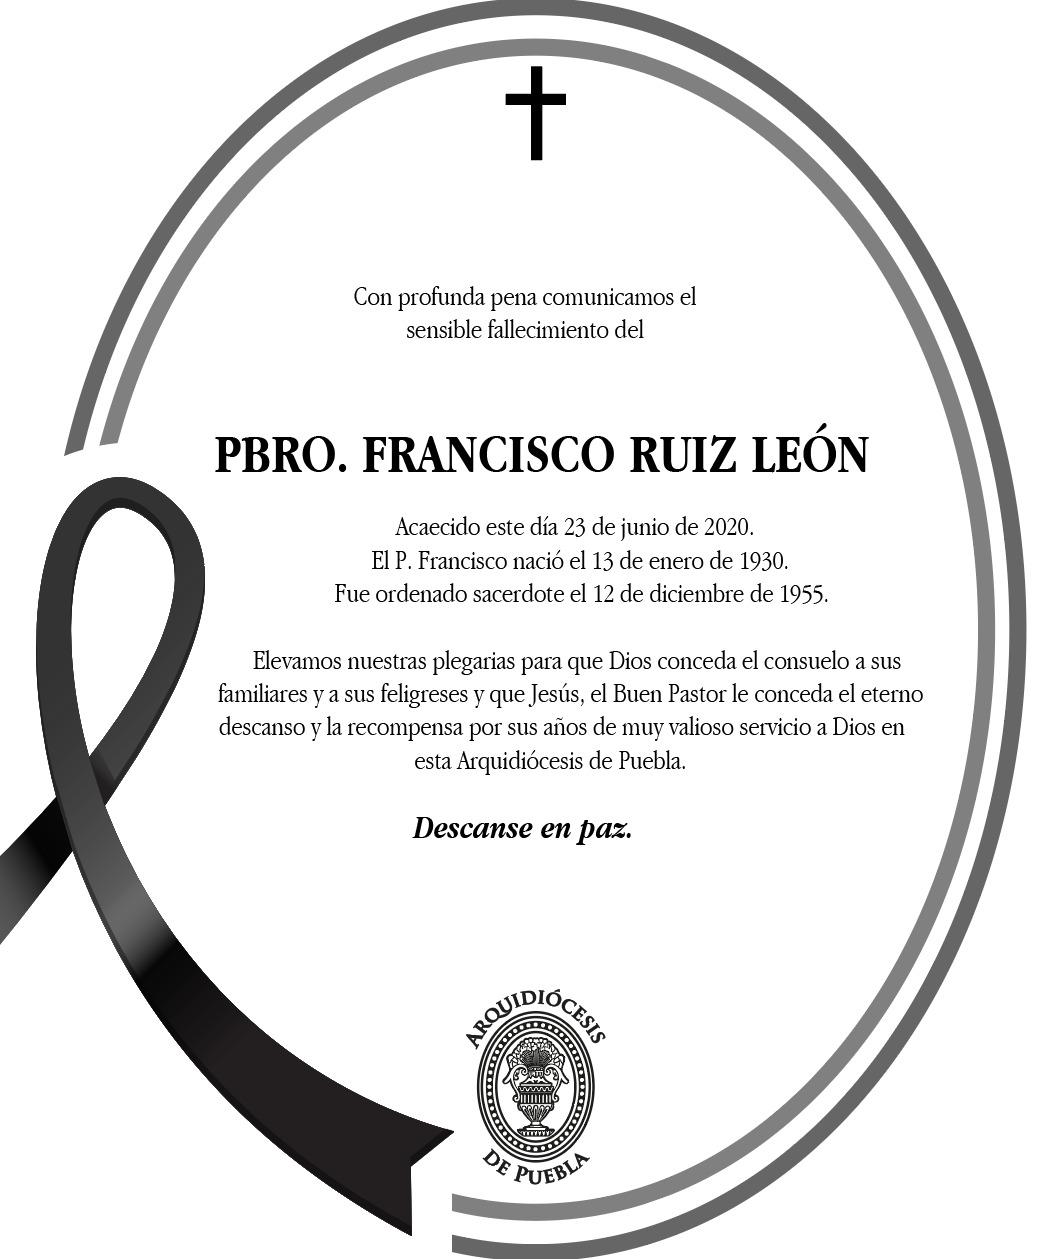 P.Francisco Ruiz